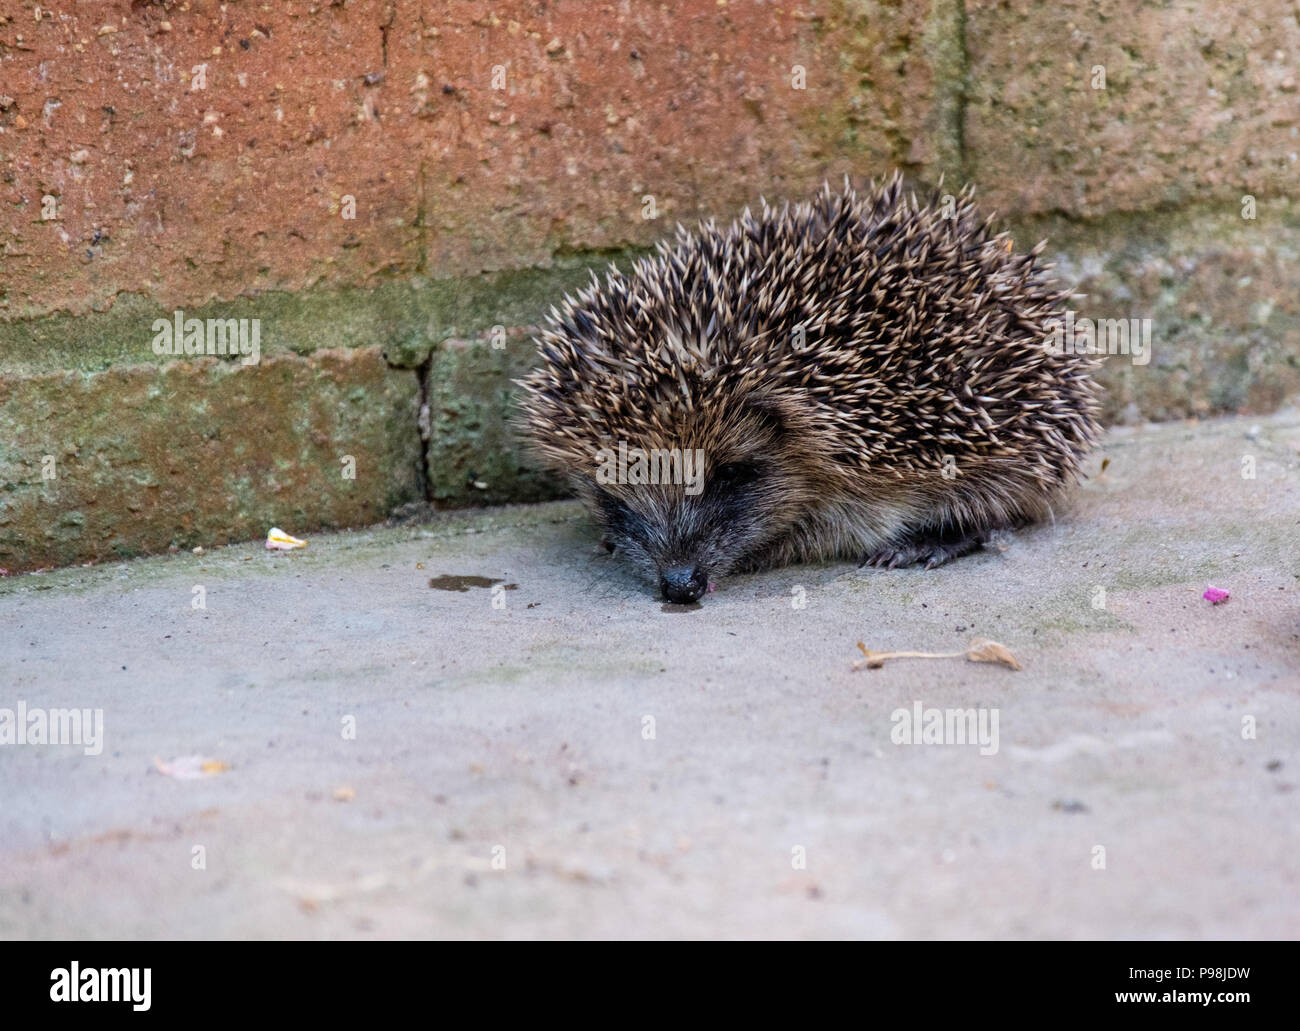 Hedgehog in garden, Church Stretton, Shropshire - Stock Image